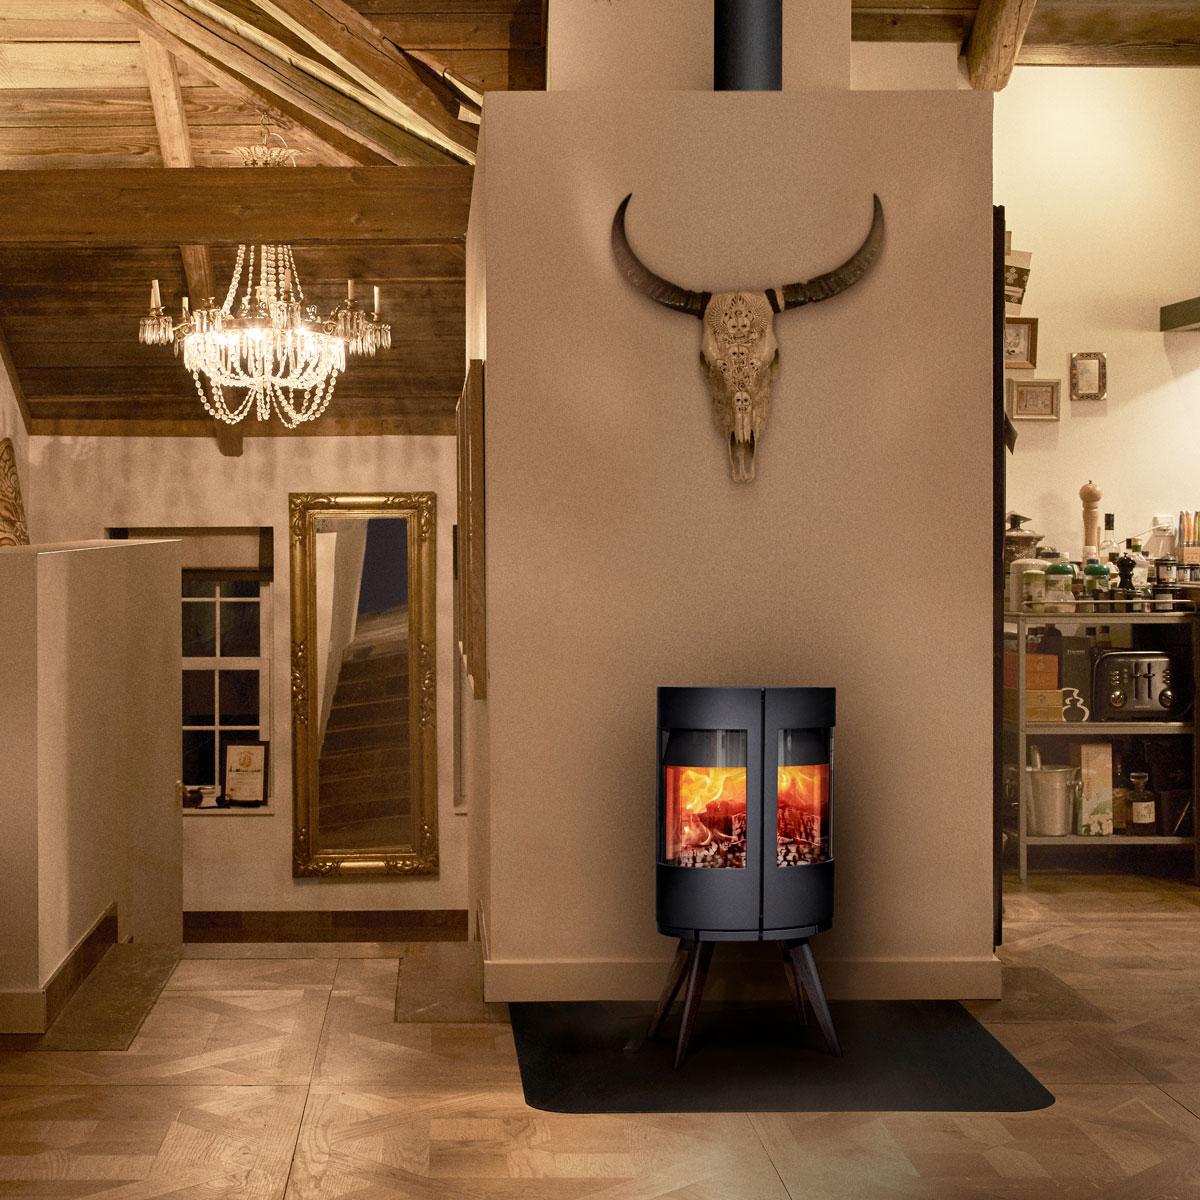 Morso 6612 freestanding wood heater on four timber legs